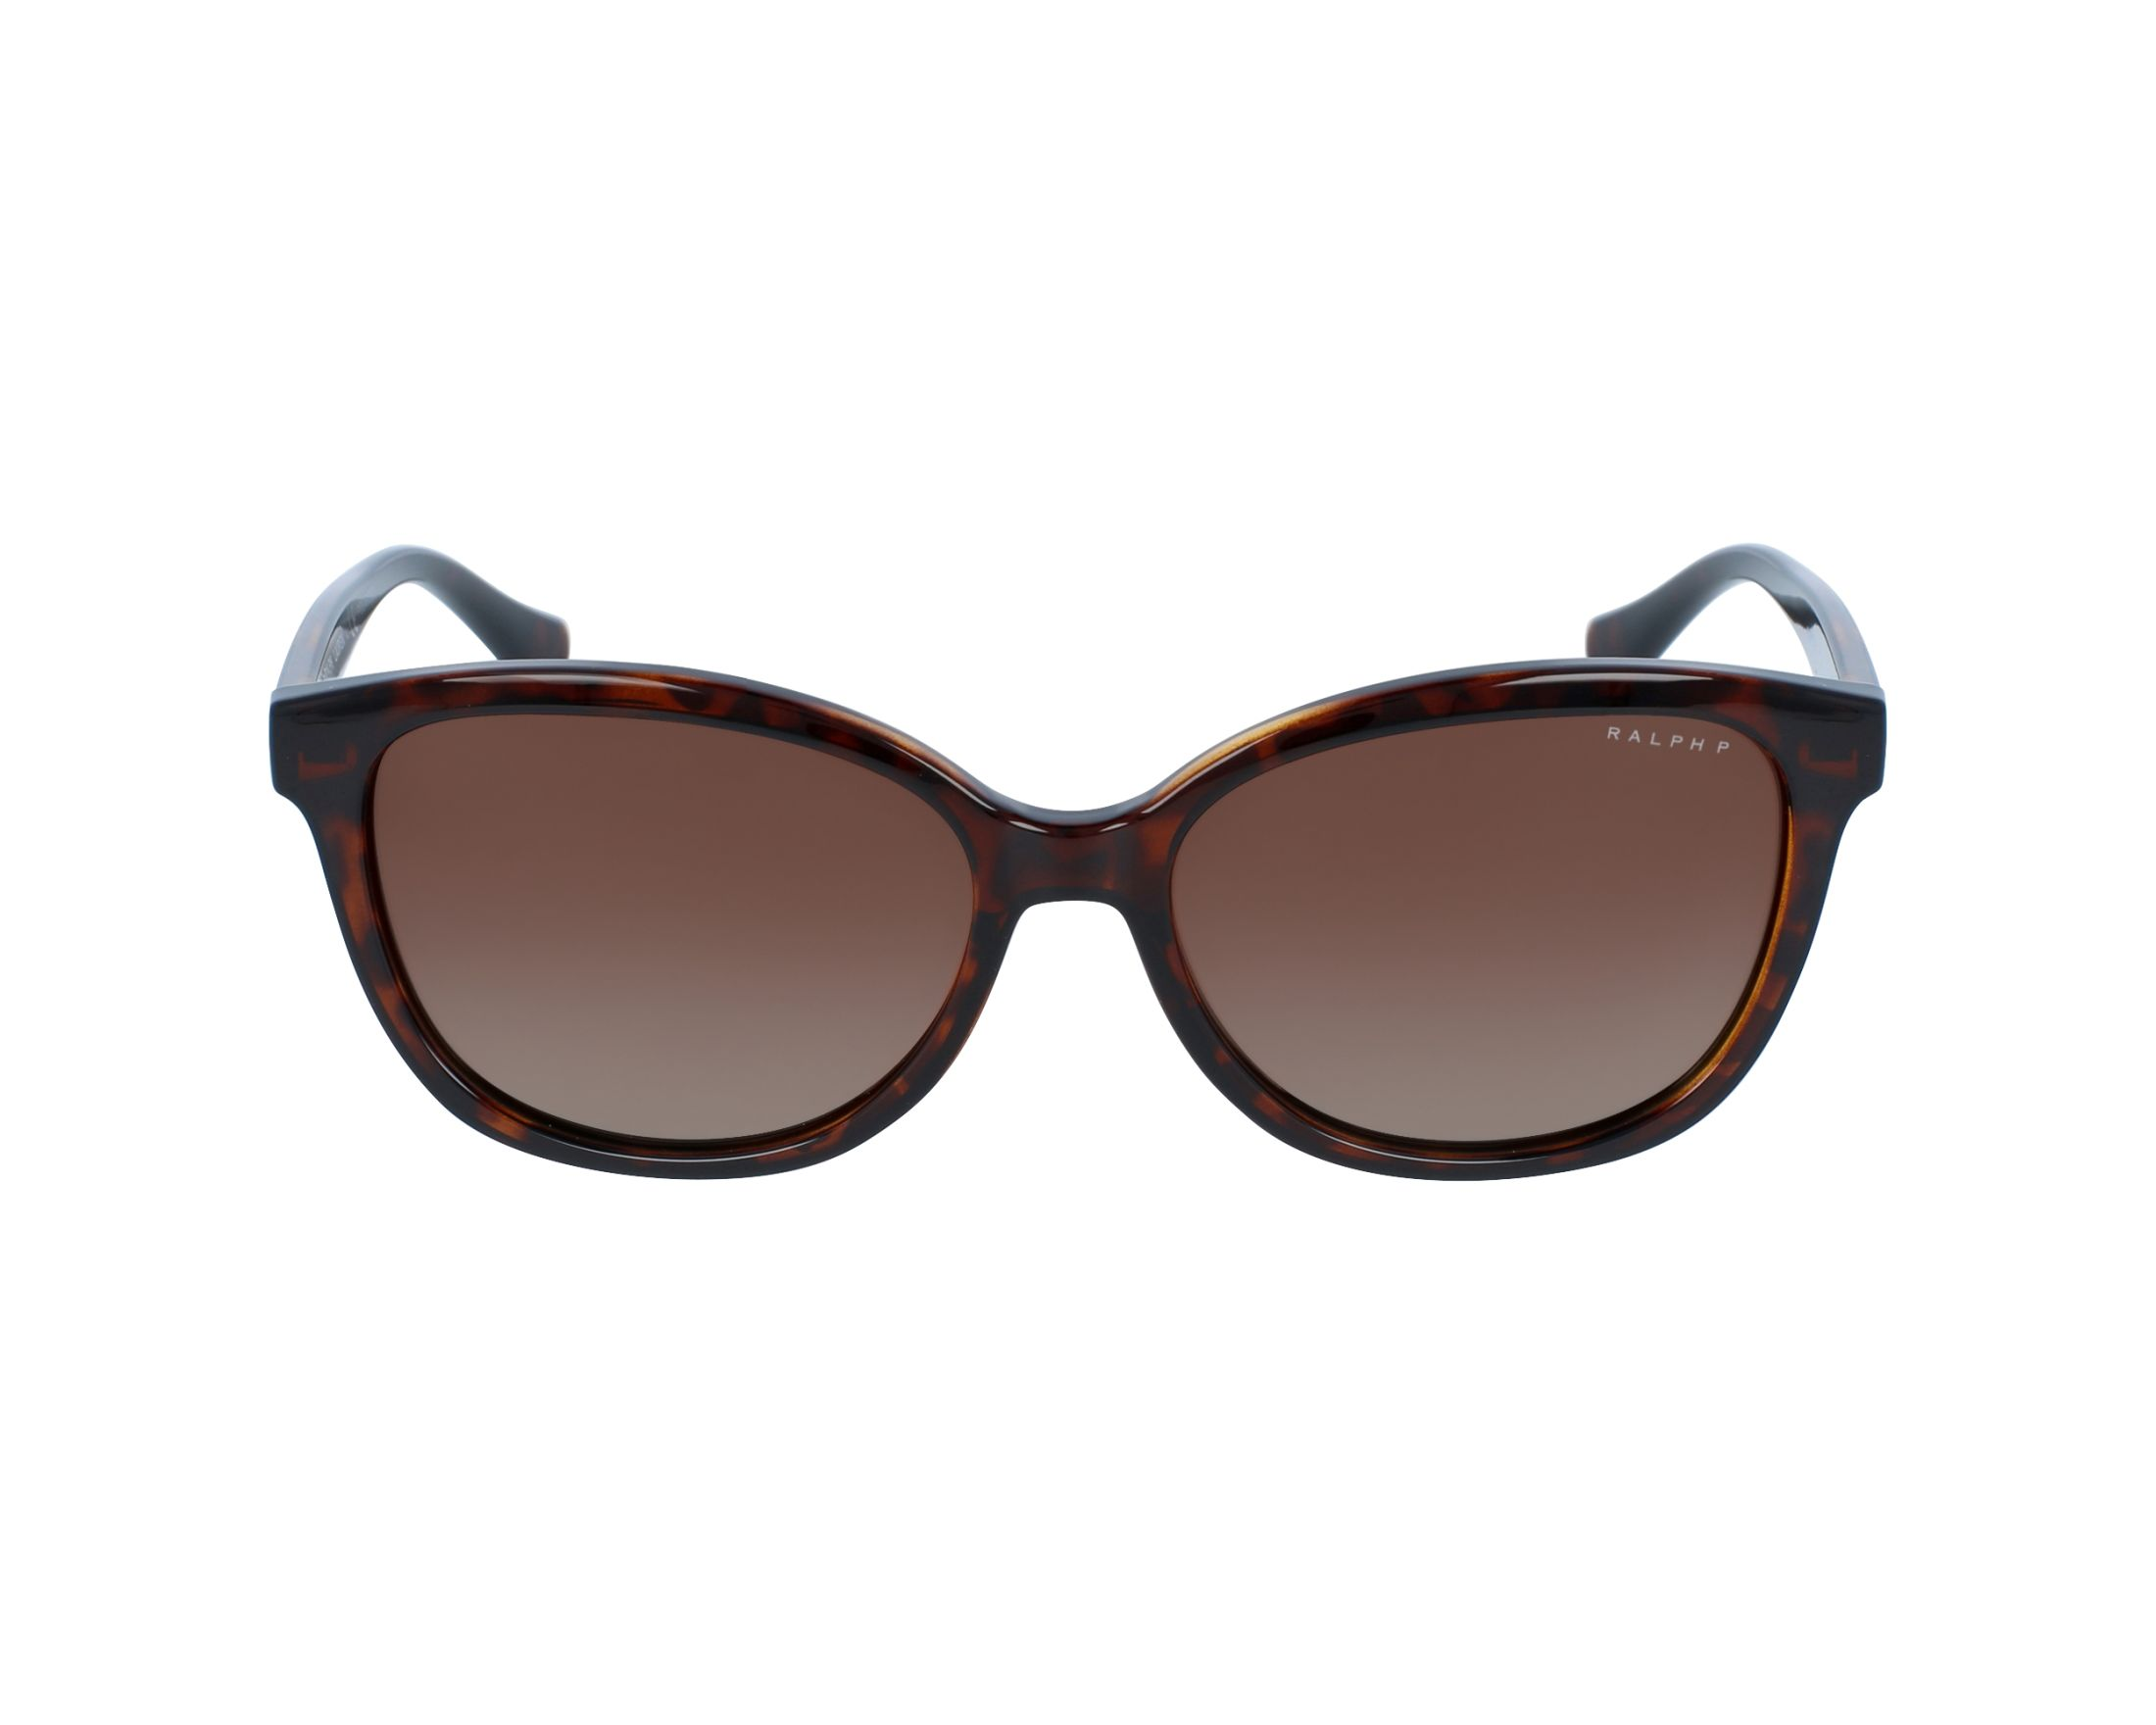 0da420195009 Polarized. Sunglasses Ralph by Ralph Lauren RA-5222 1378T5 56-16 Havana  profile view